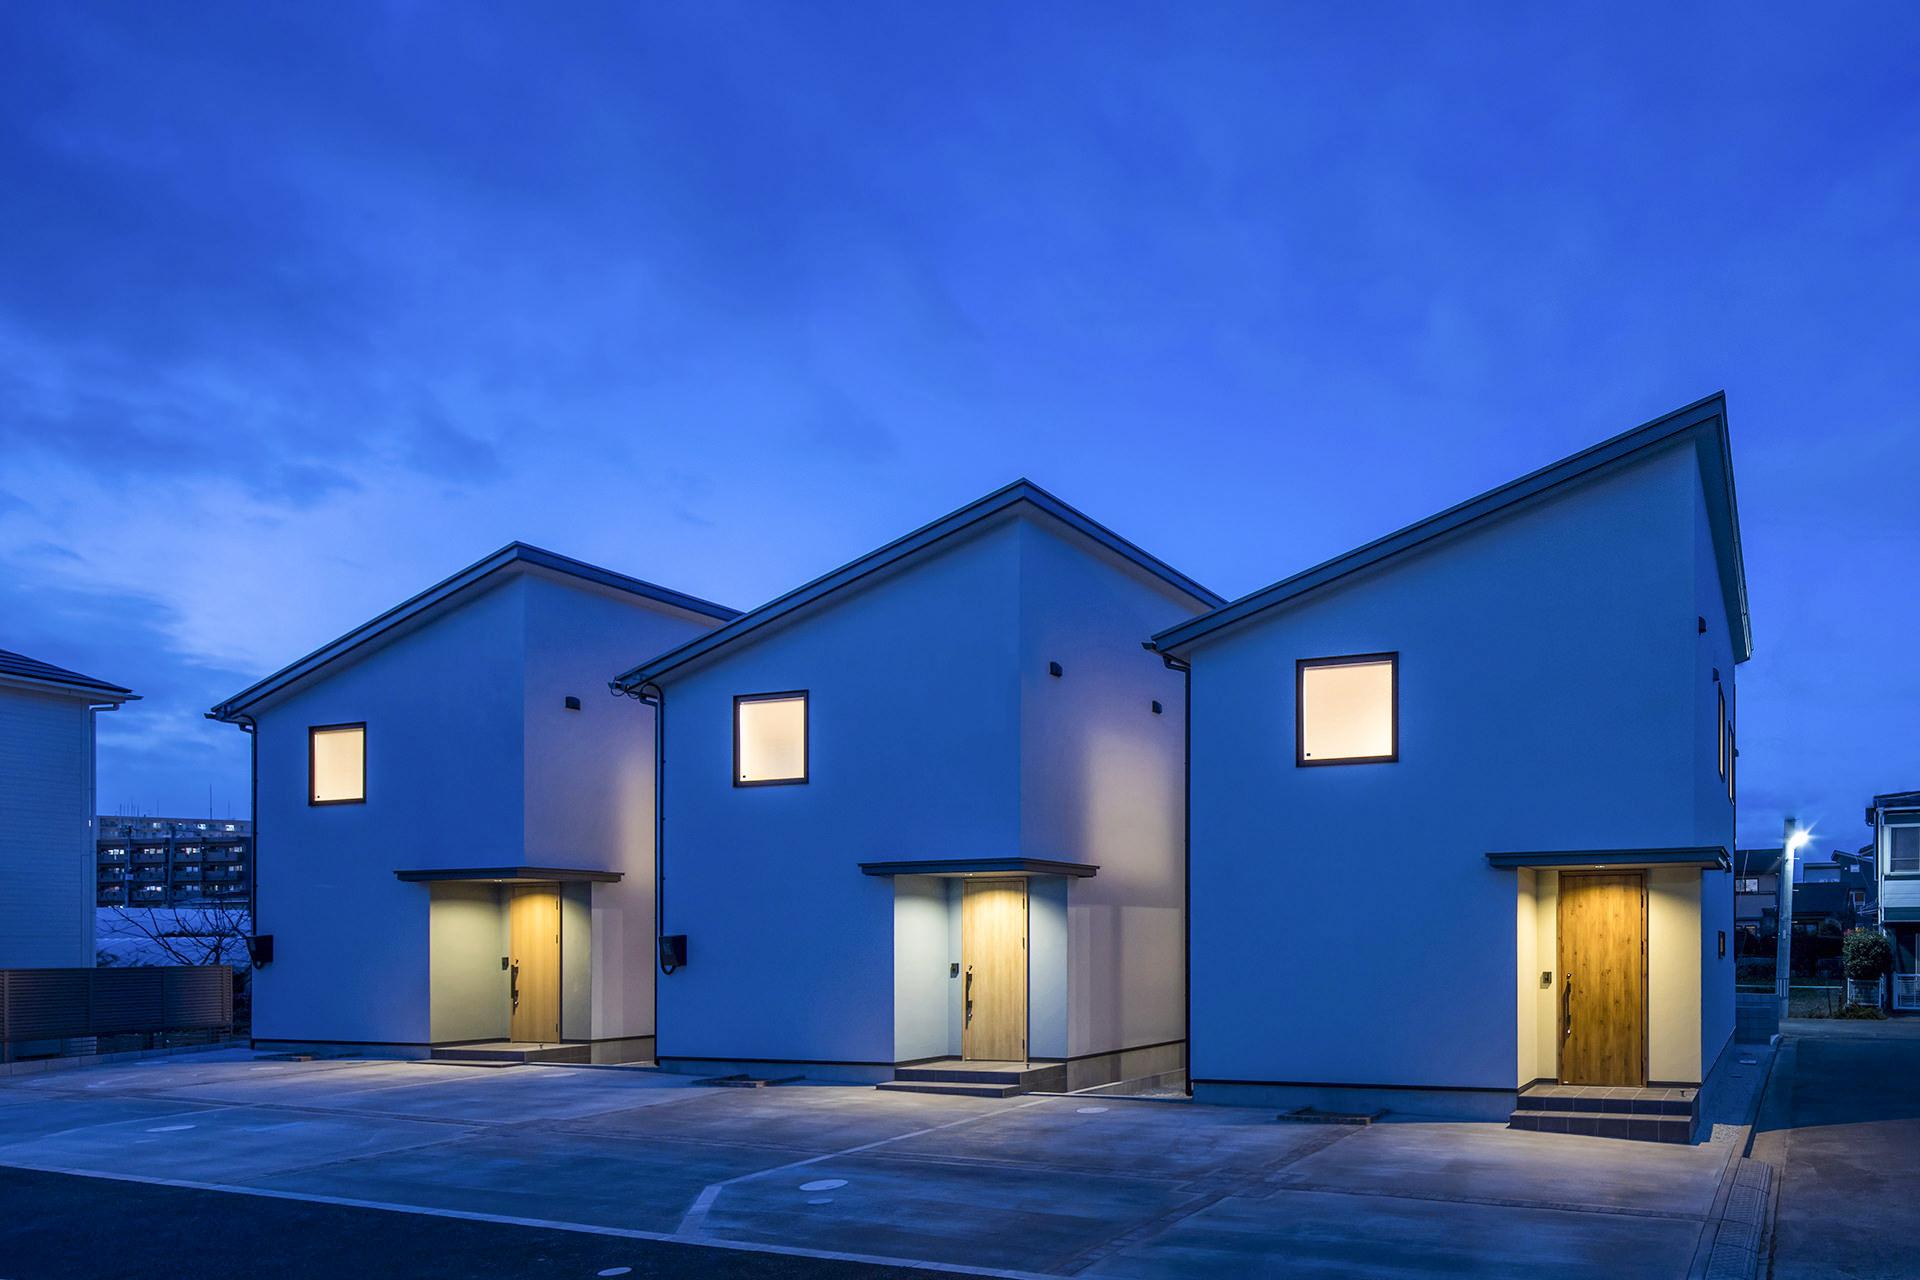 「casa rozzo」外観・夕景イメージ 撮影:東涌宏和